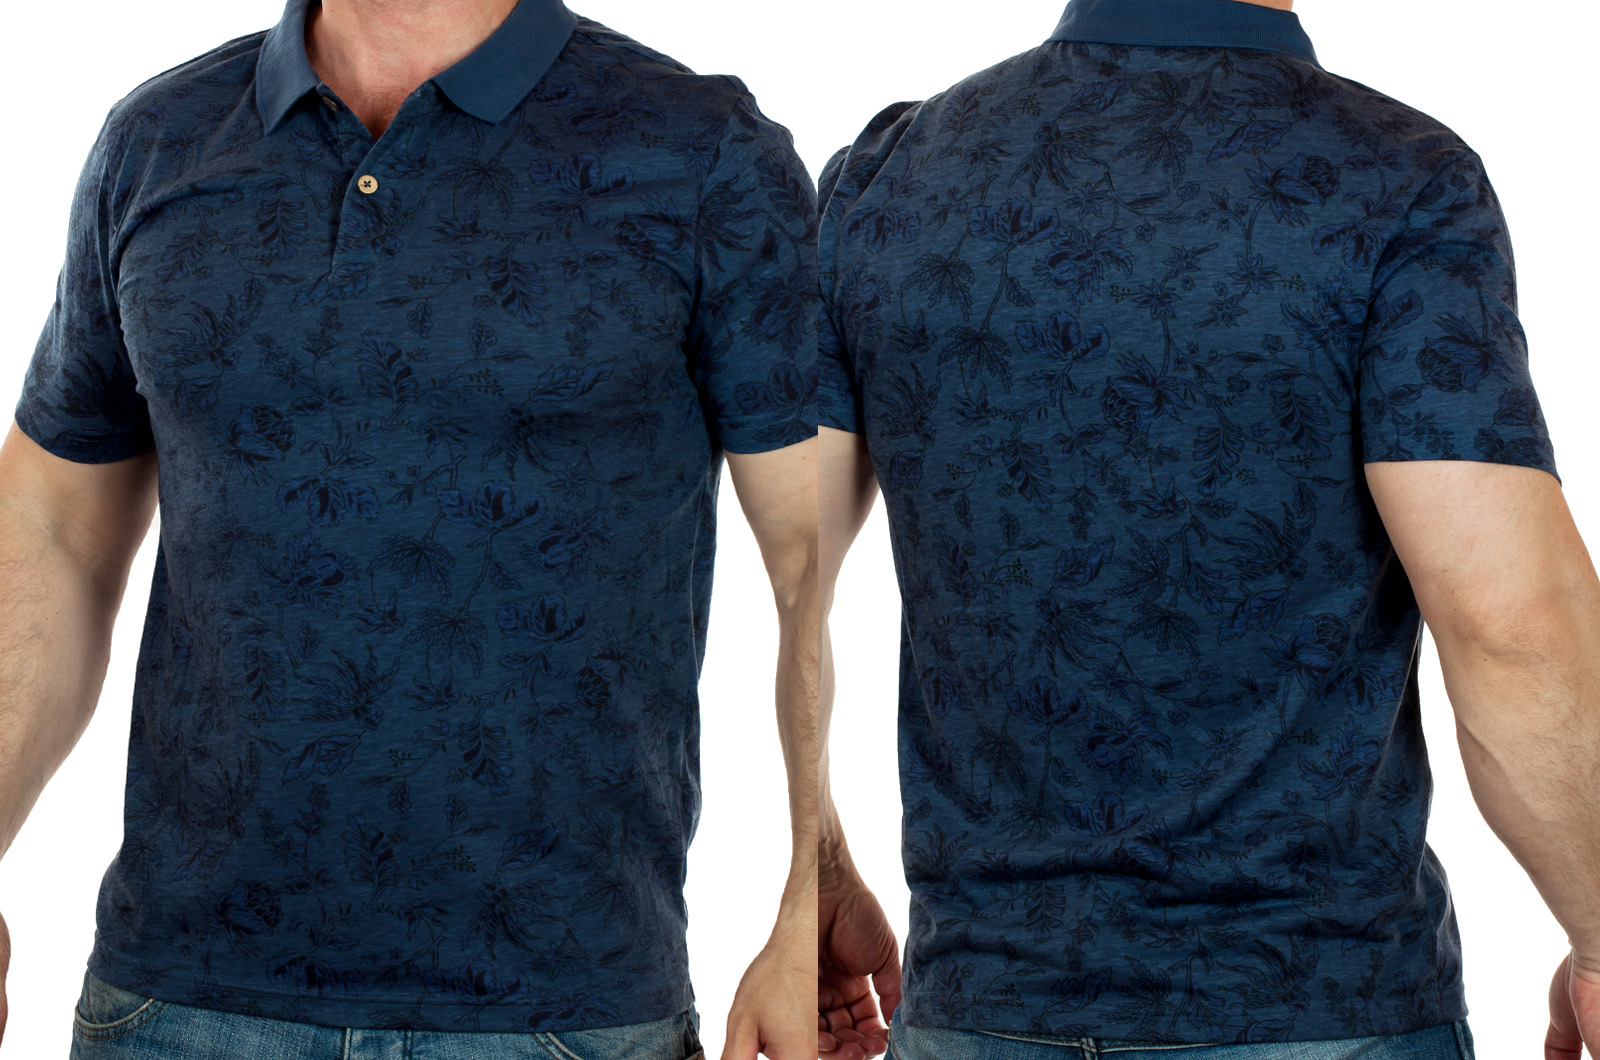 Стильная летняя футболка для мужчин от Max Youngmen